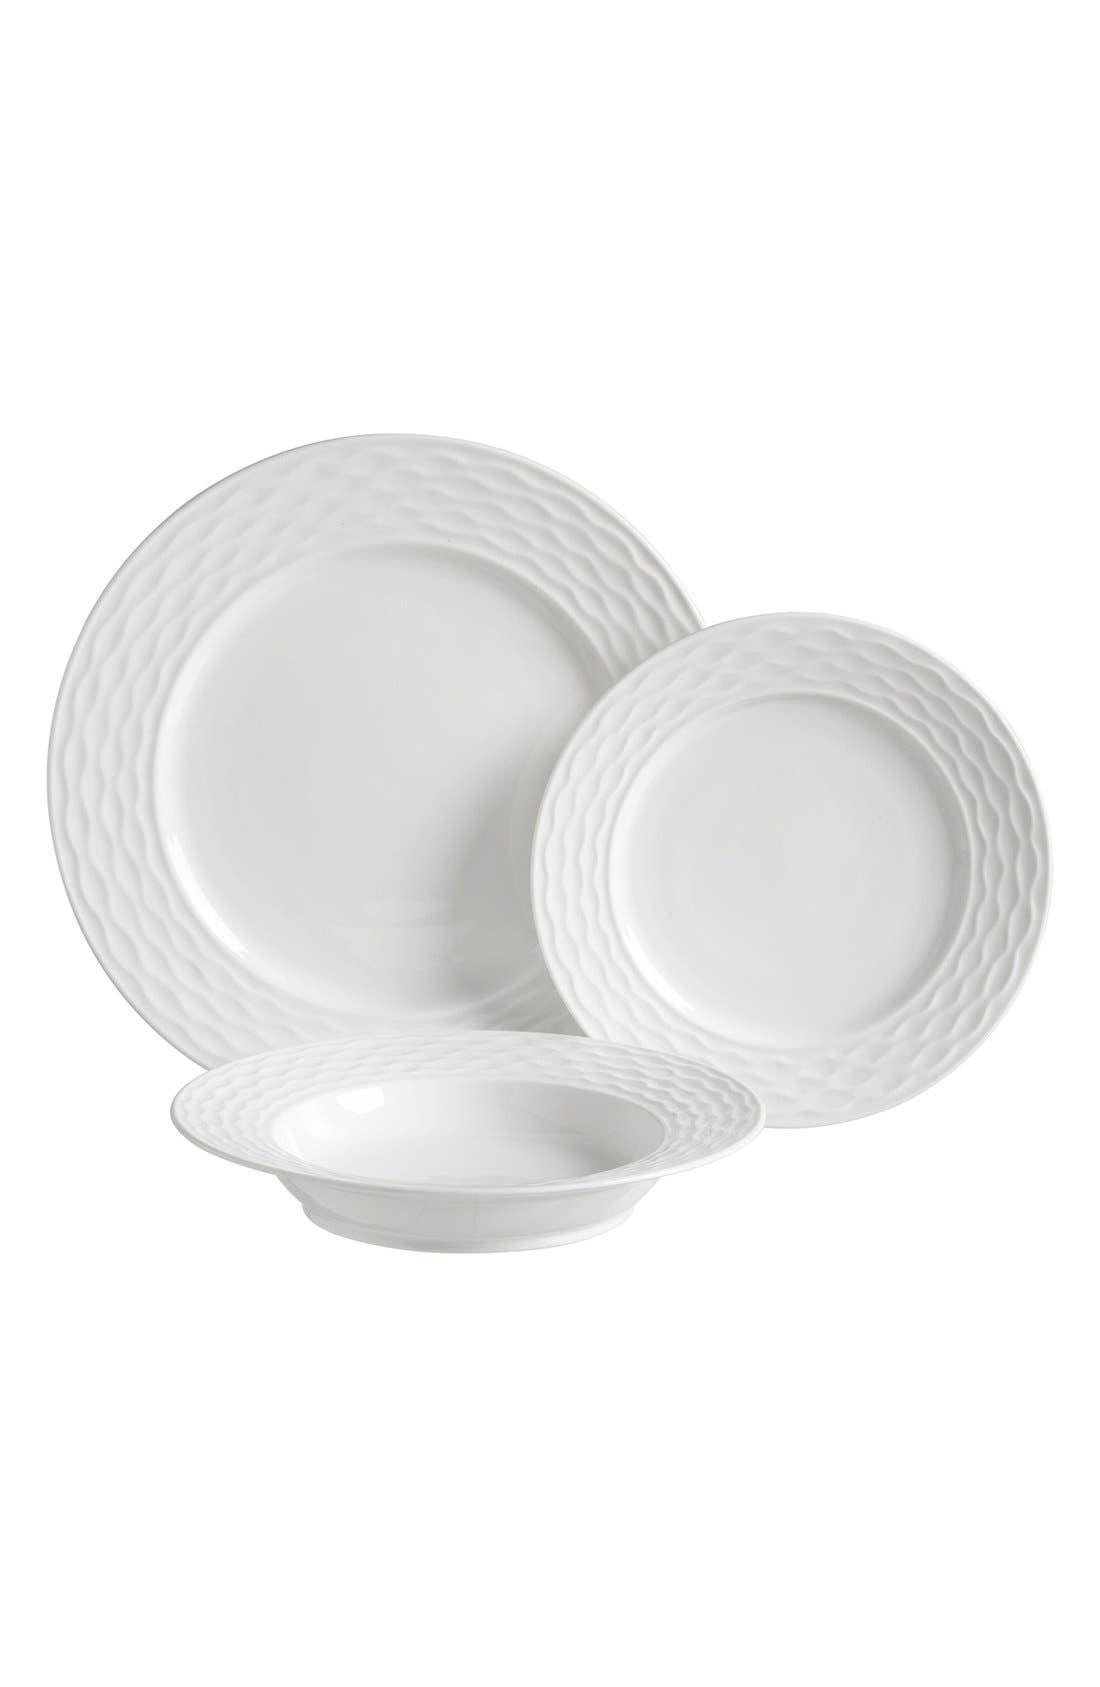 Alternate Image 1 Selected - Luigi Bormioli Porcelain Dinnerware (12-Piece Set)